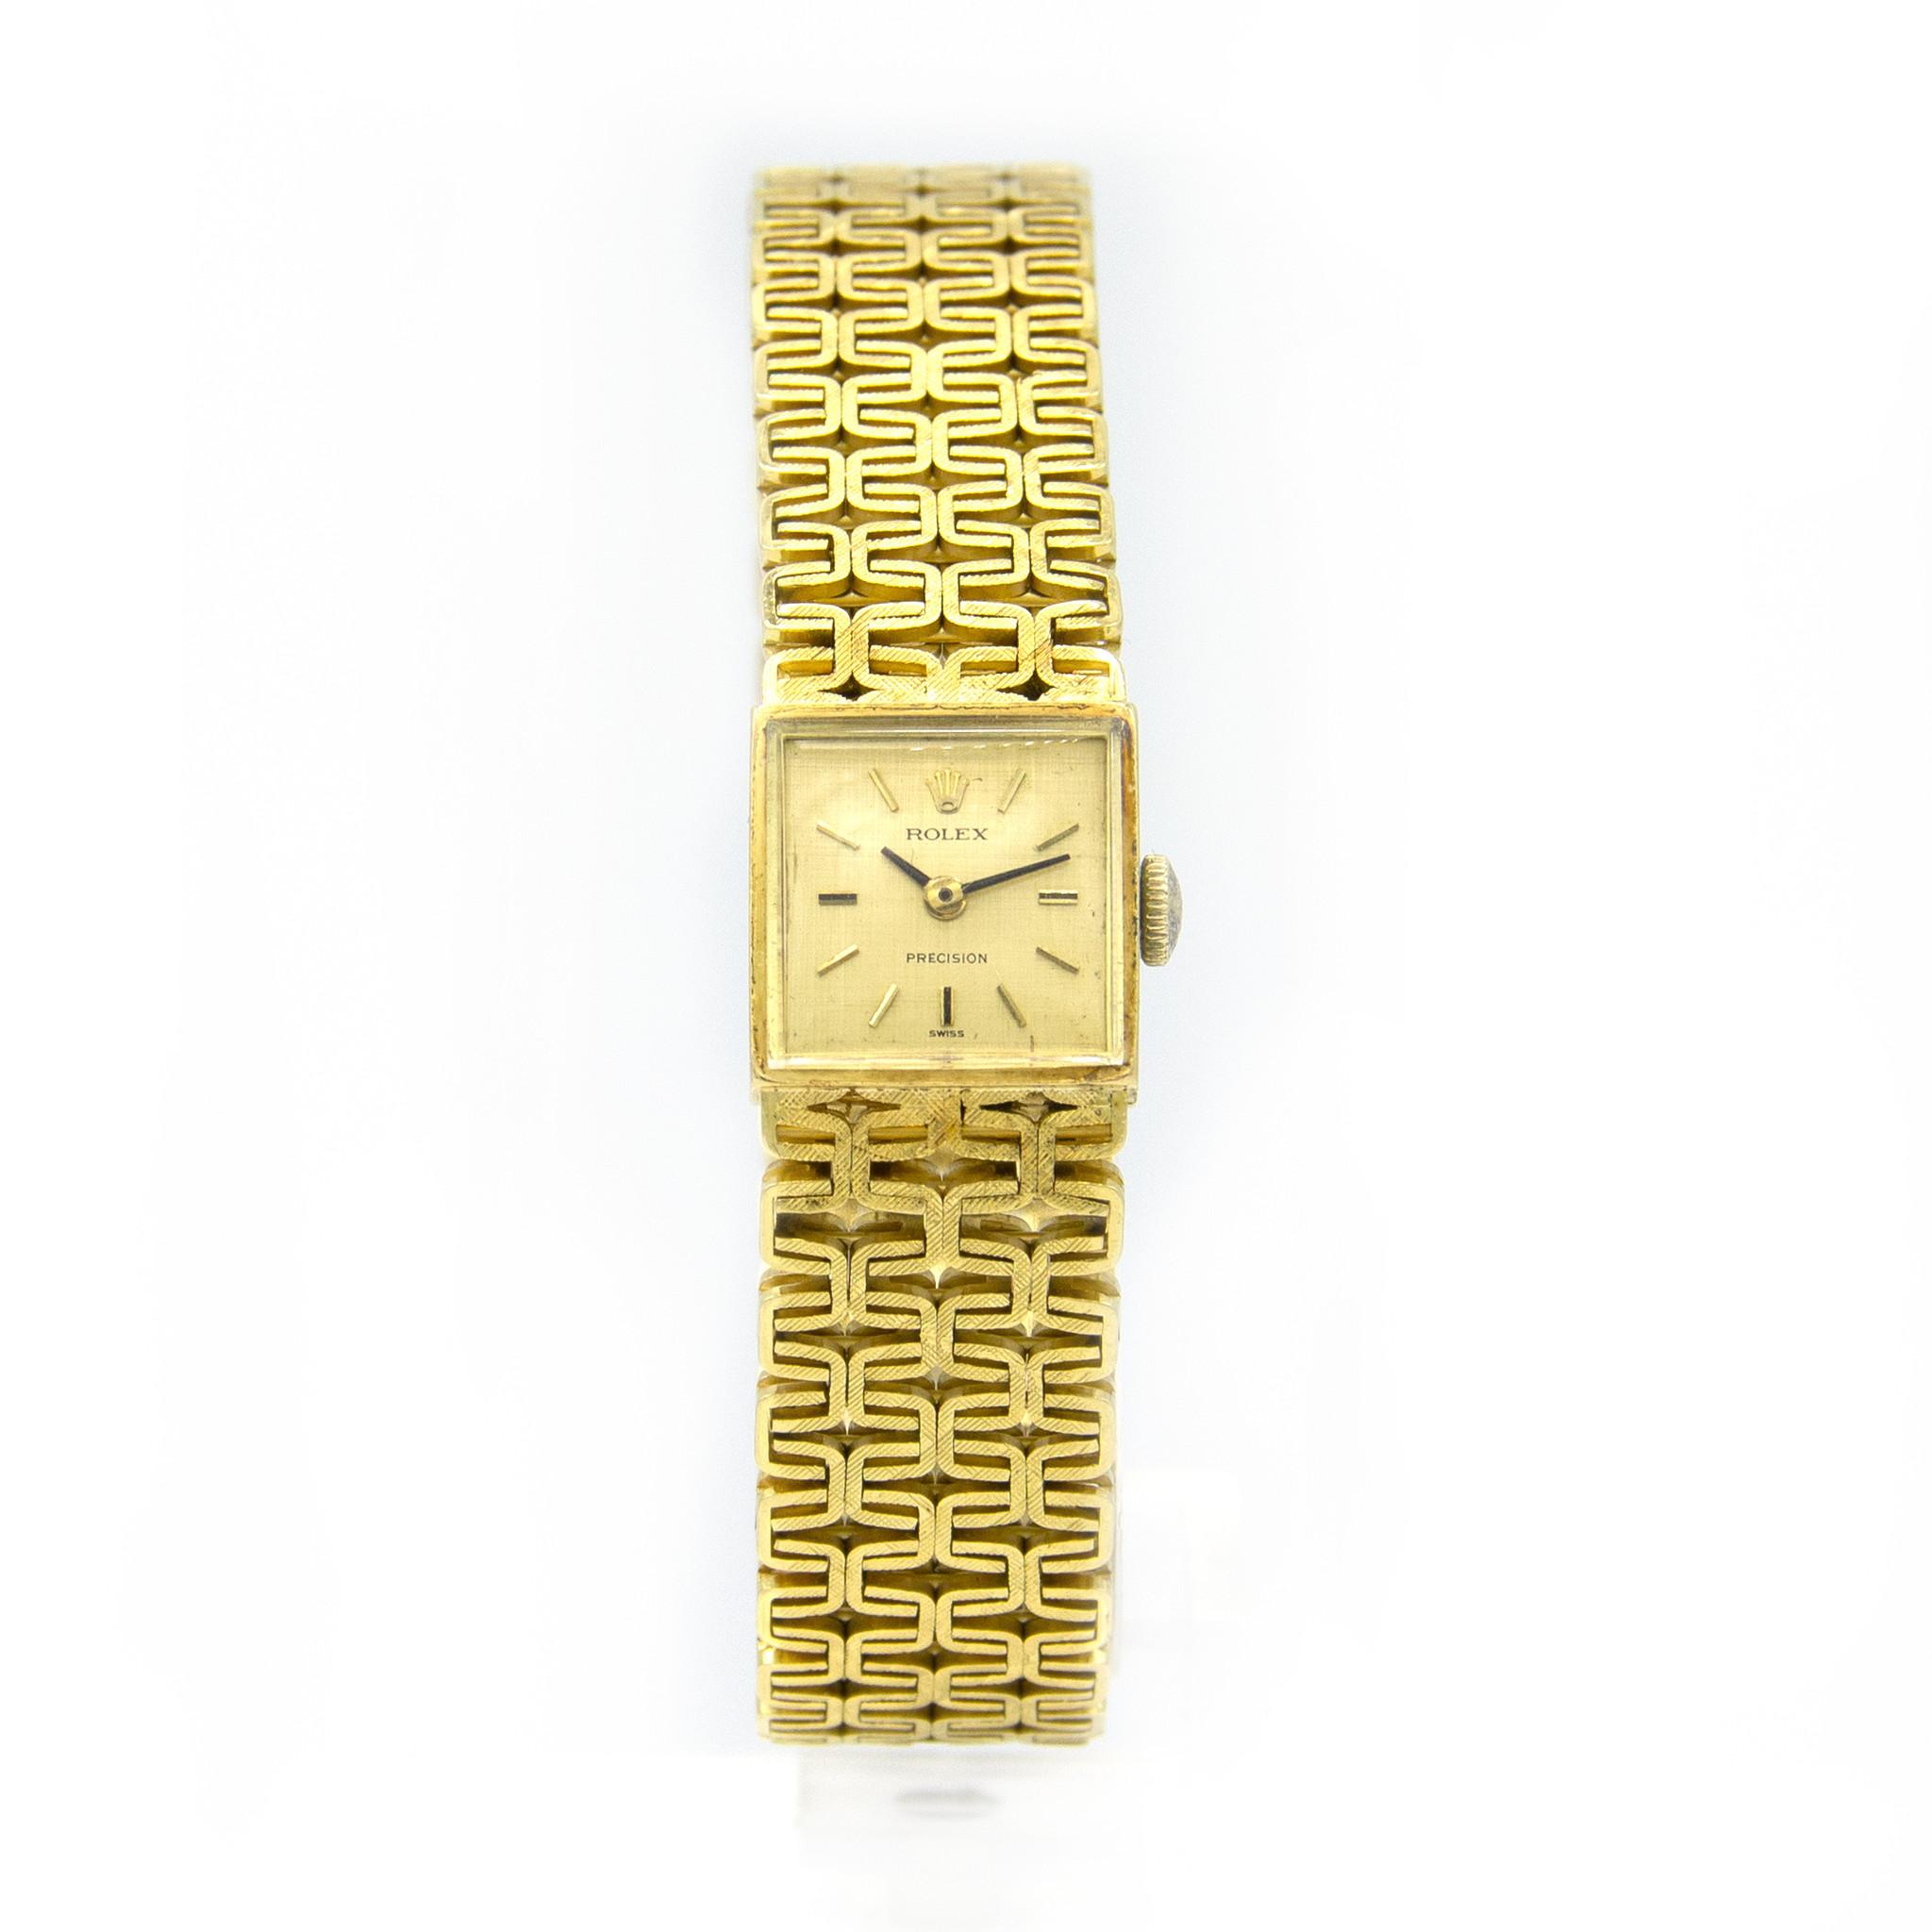 Rolex Precision -  Dames Horloge - 18 karaat geelgoud-3